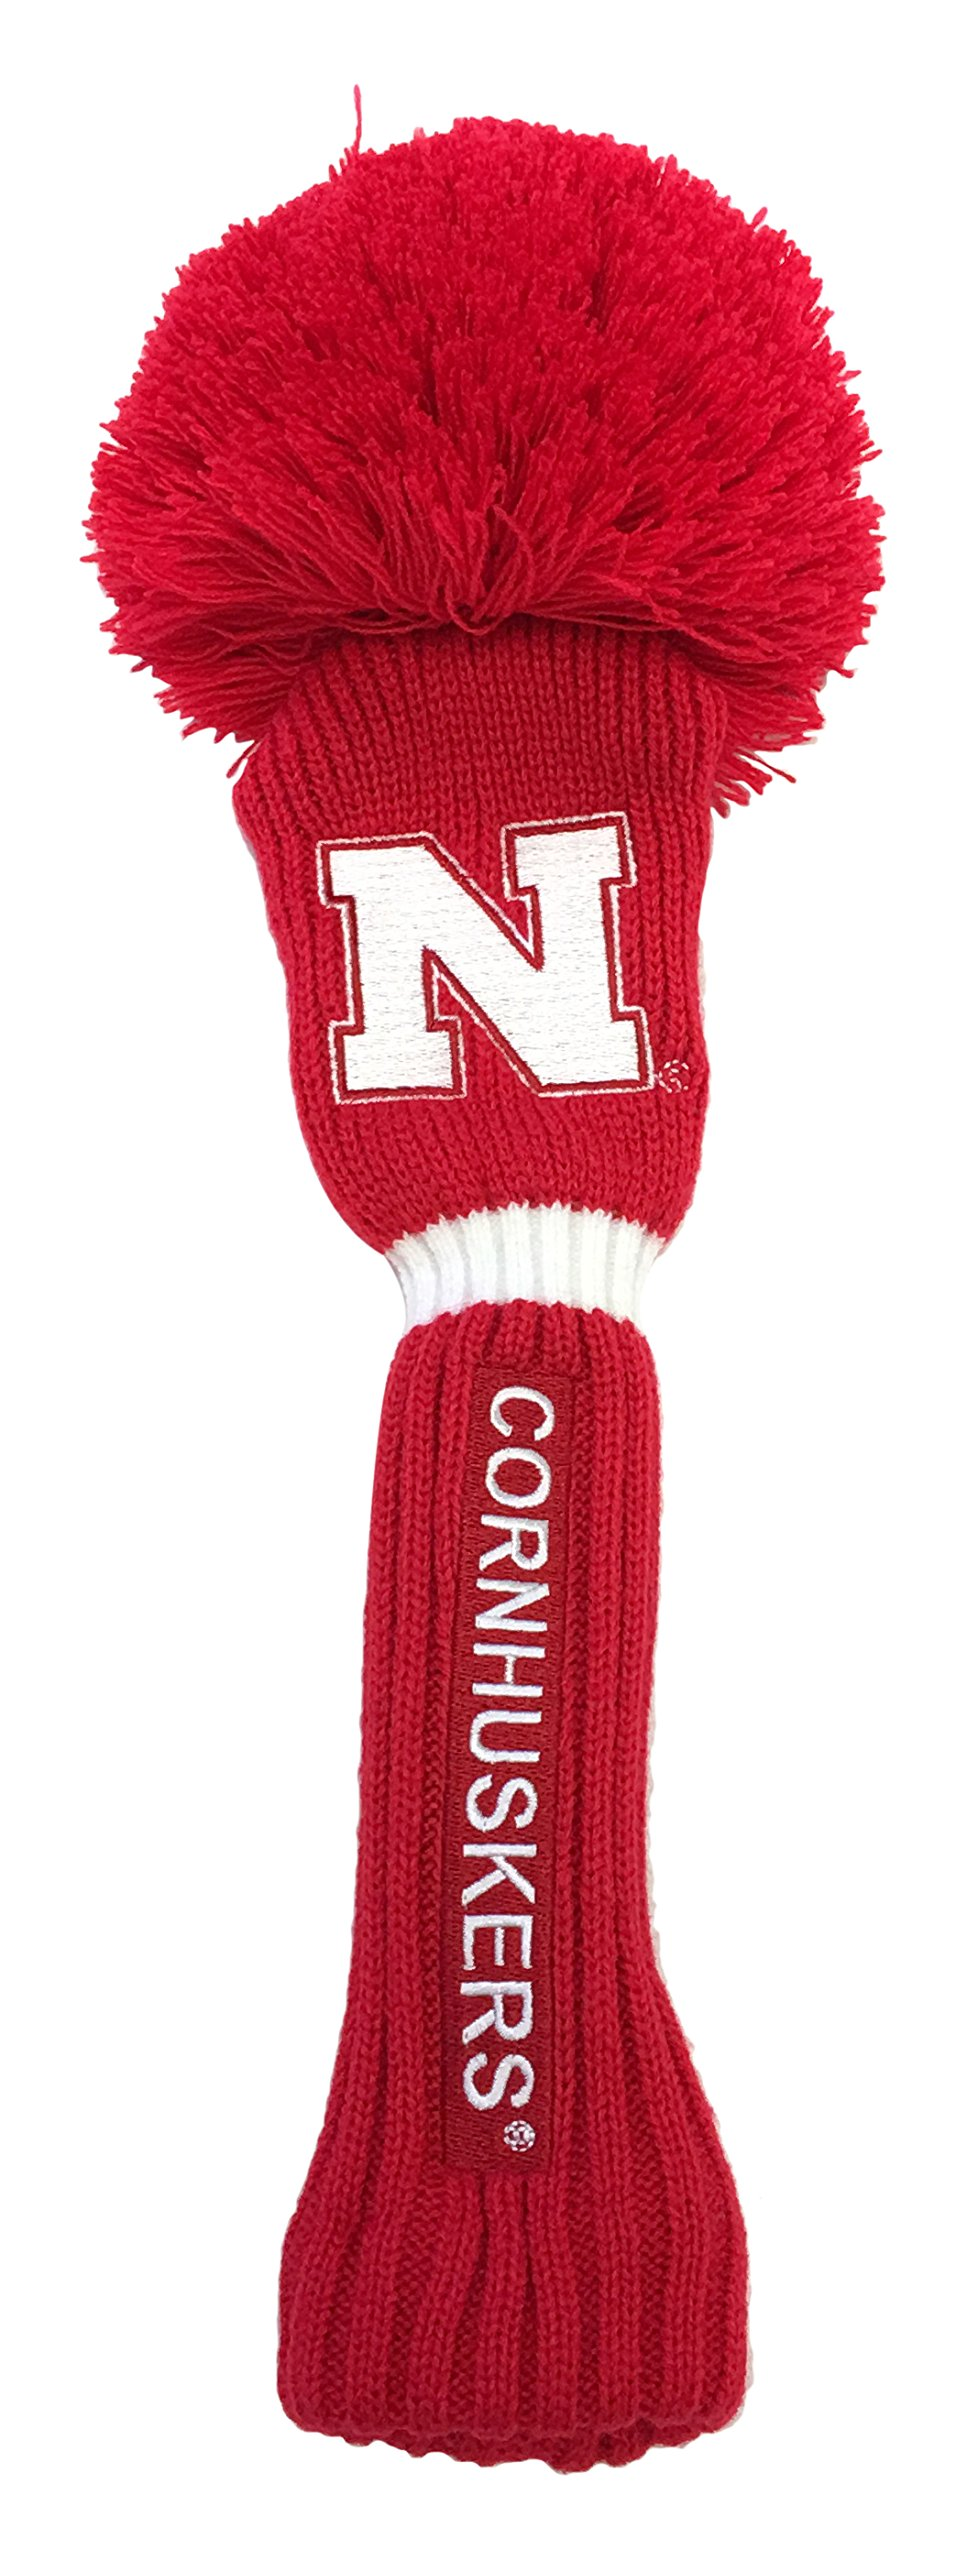 NCAA Nebraska Cornhuskers Pom Fairway Head Cover, Red